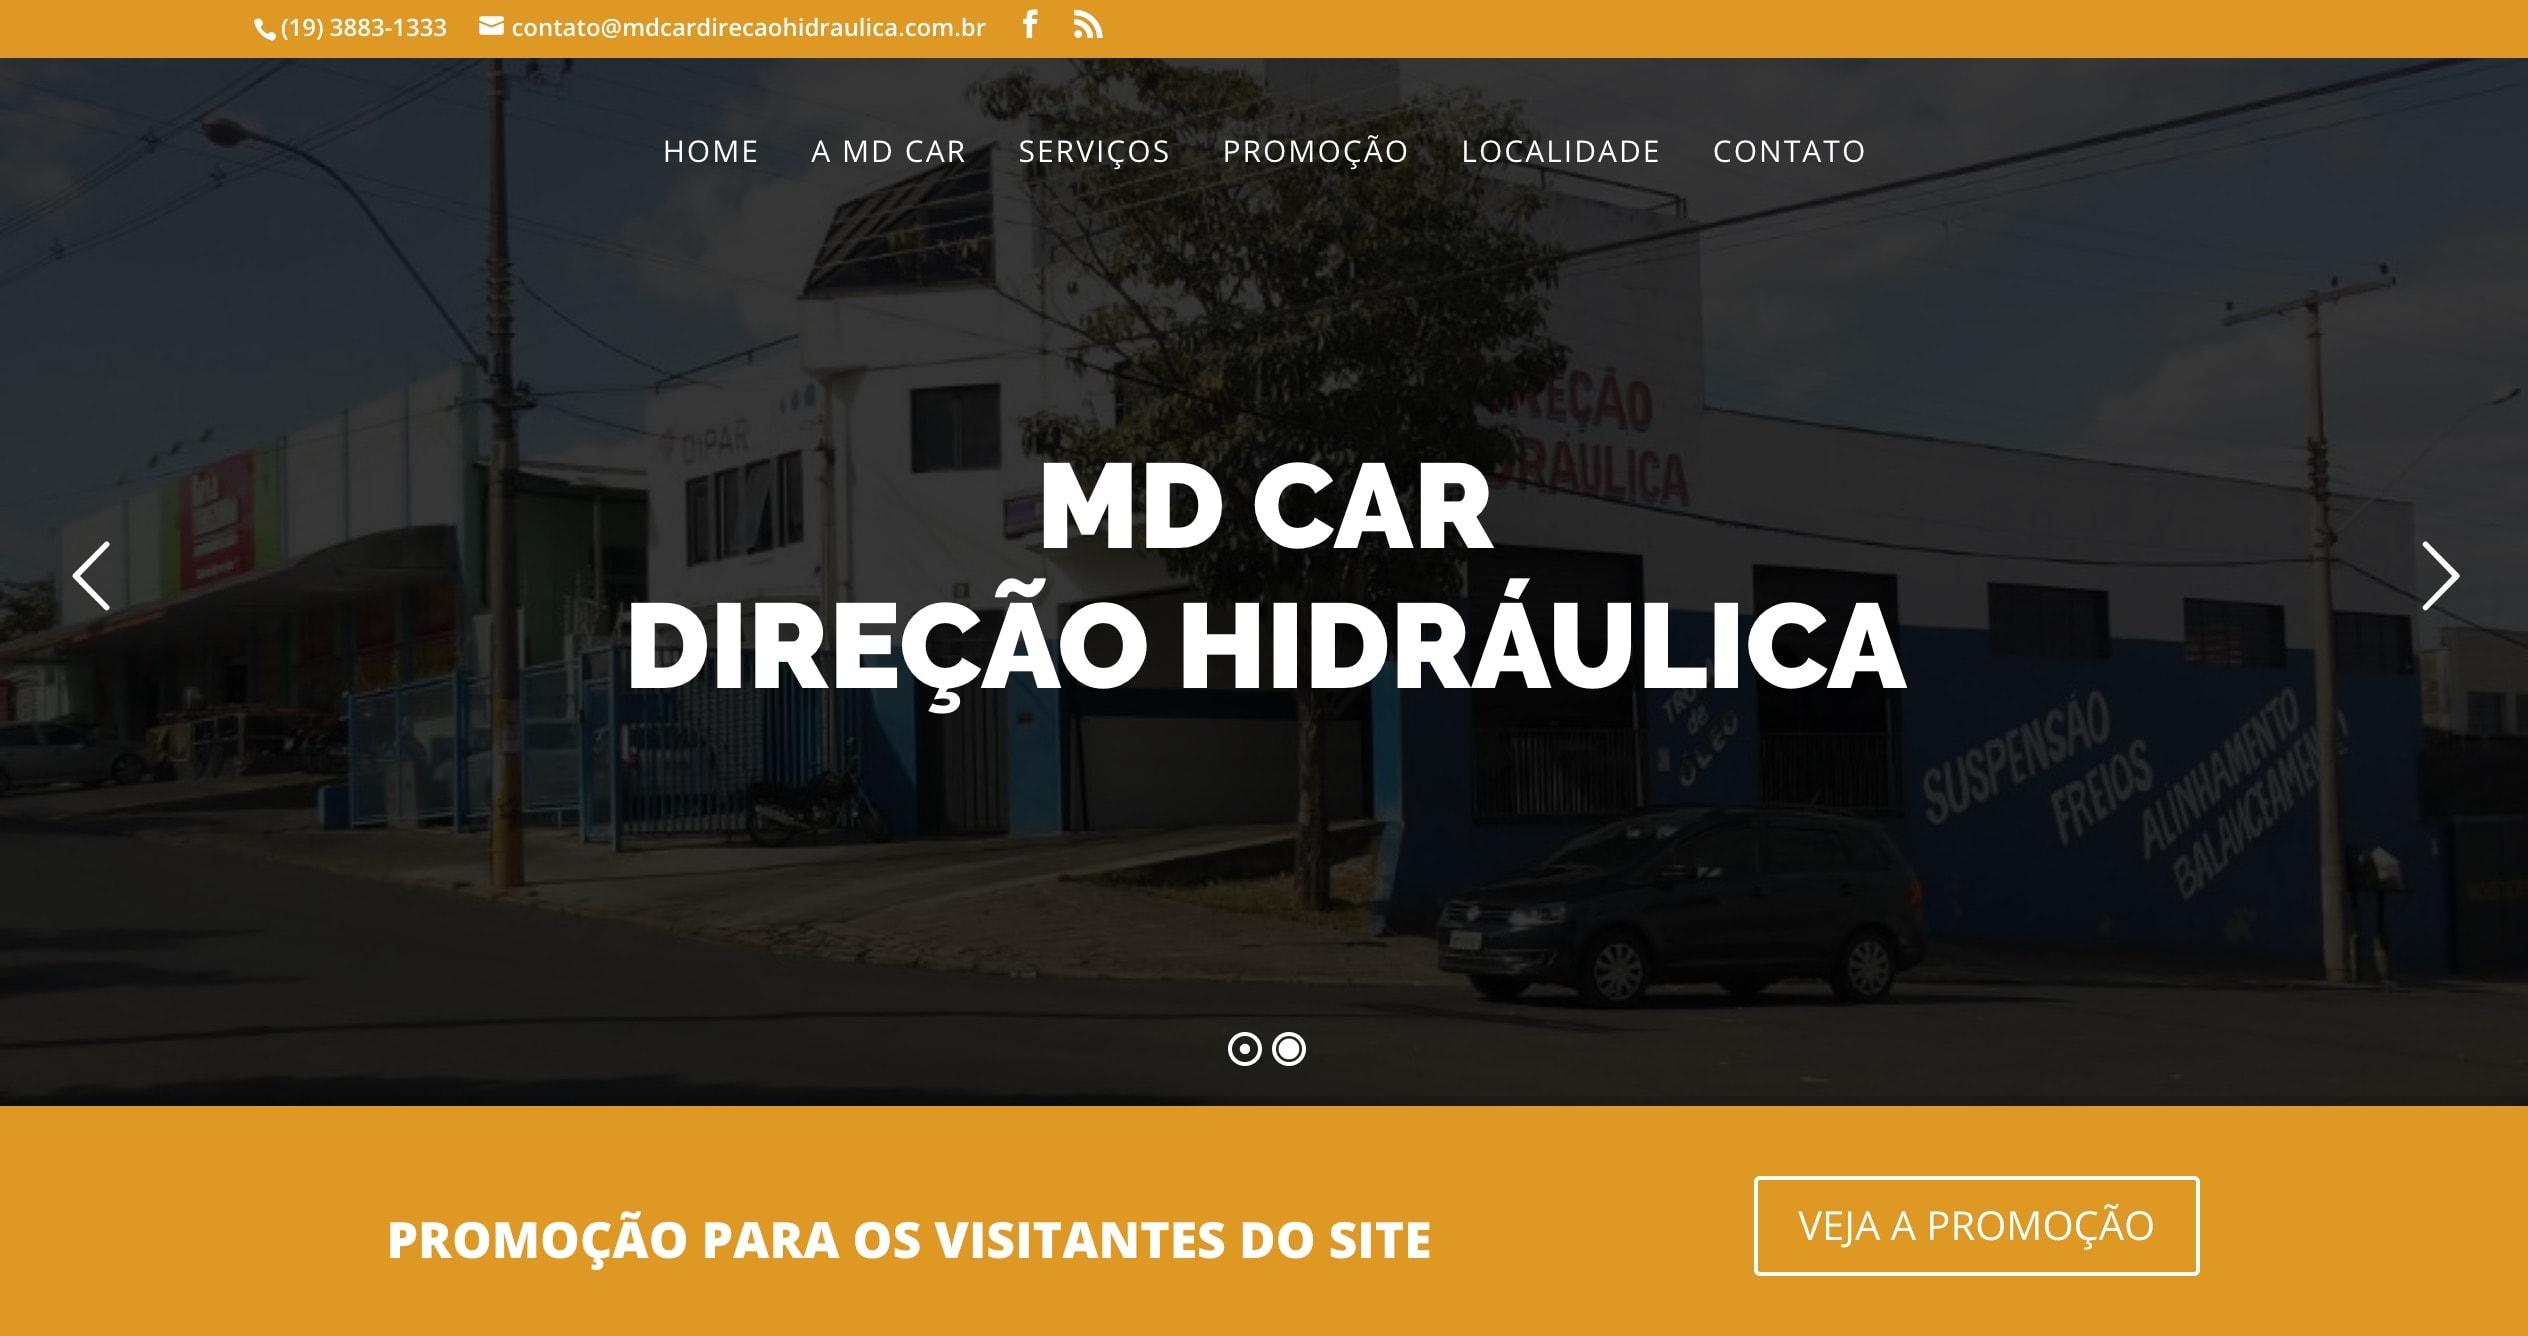 MD CAR Direção Hidráulica